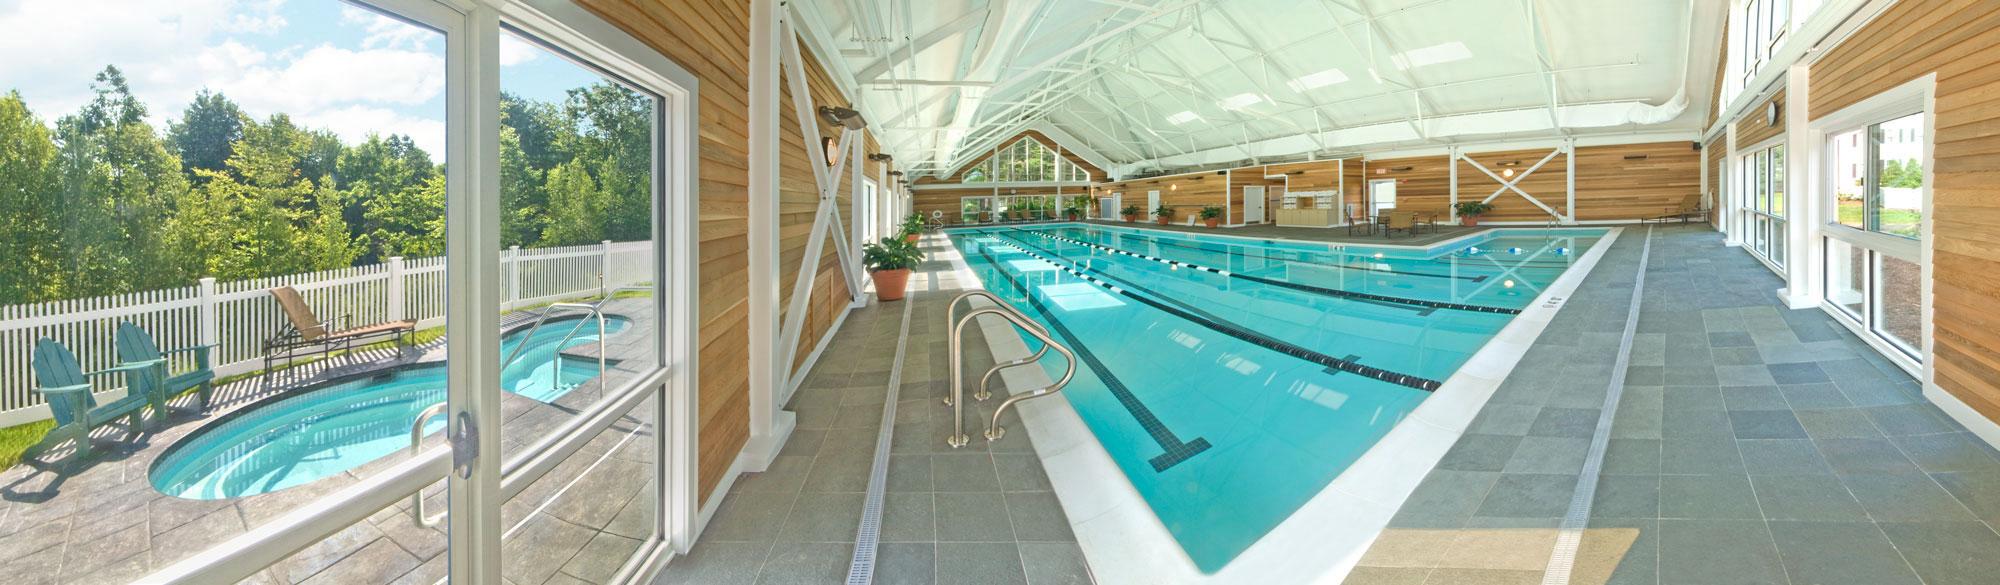 The Essex Resort Pool